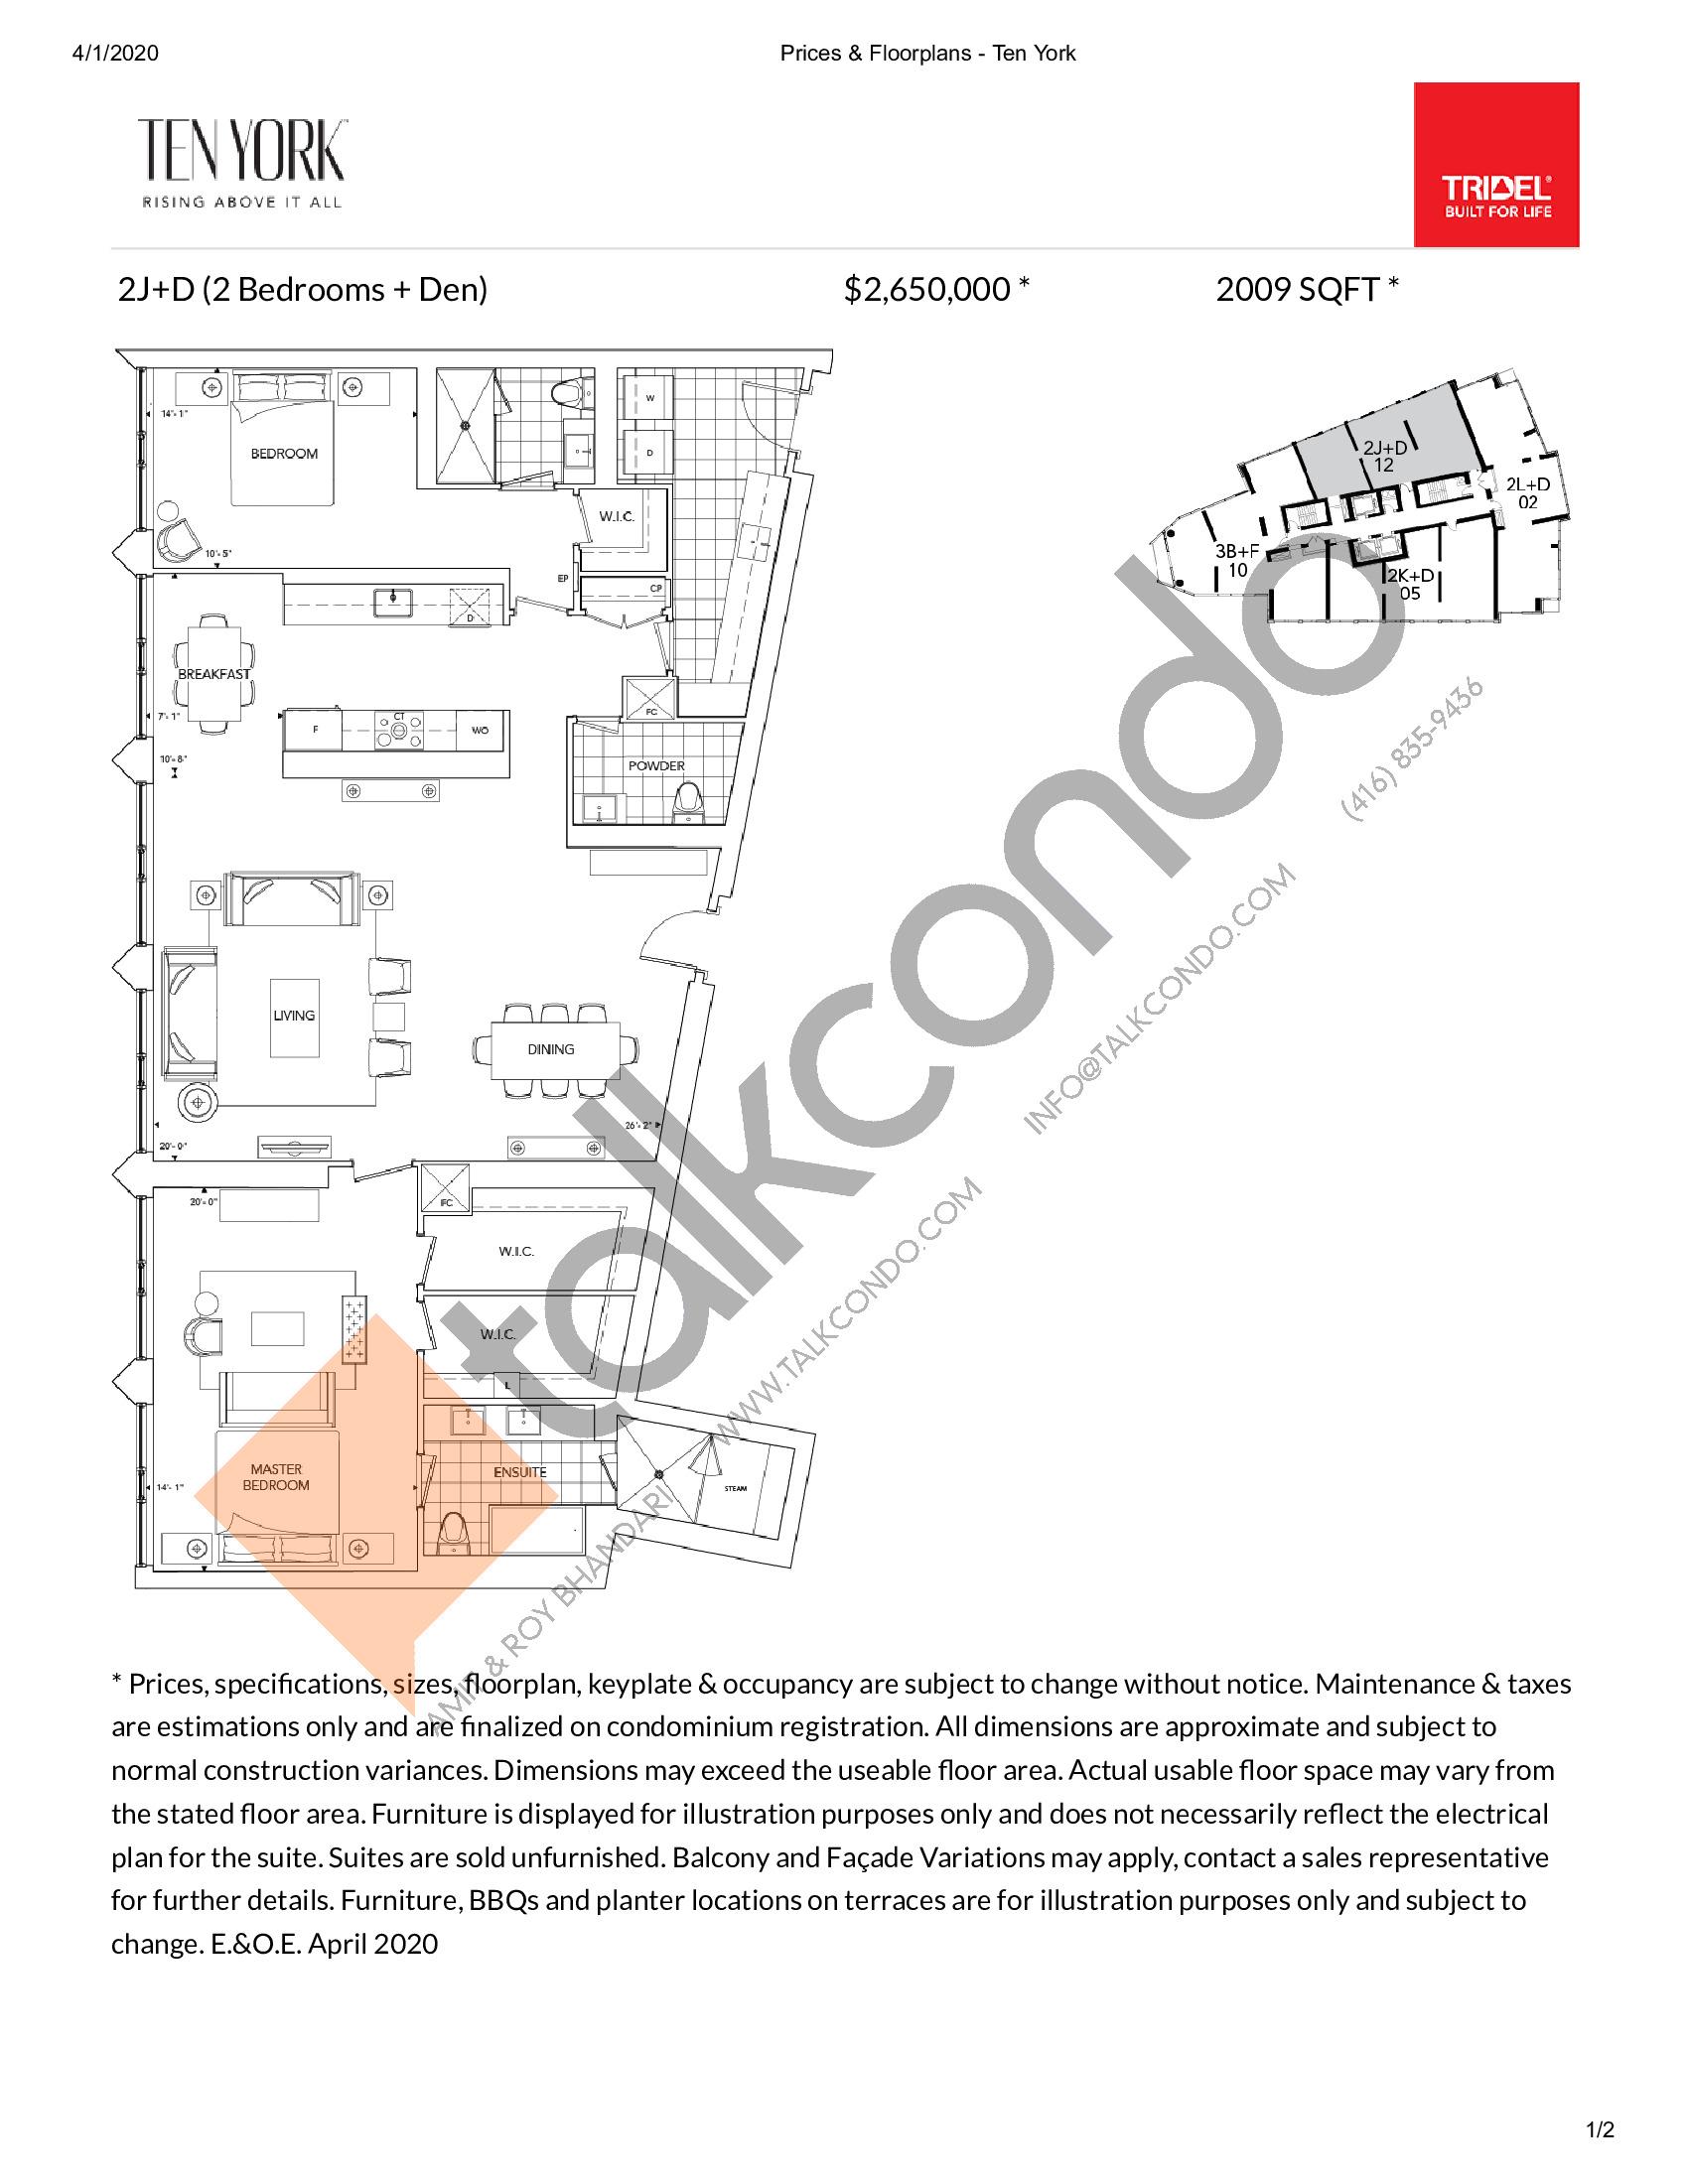 2J+D Floor Plan at Ten York Condos - 2009 sq.ft